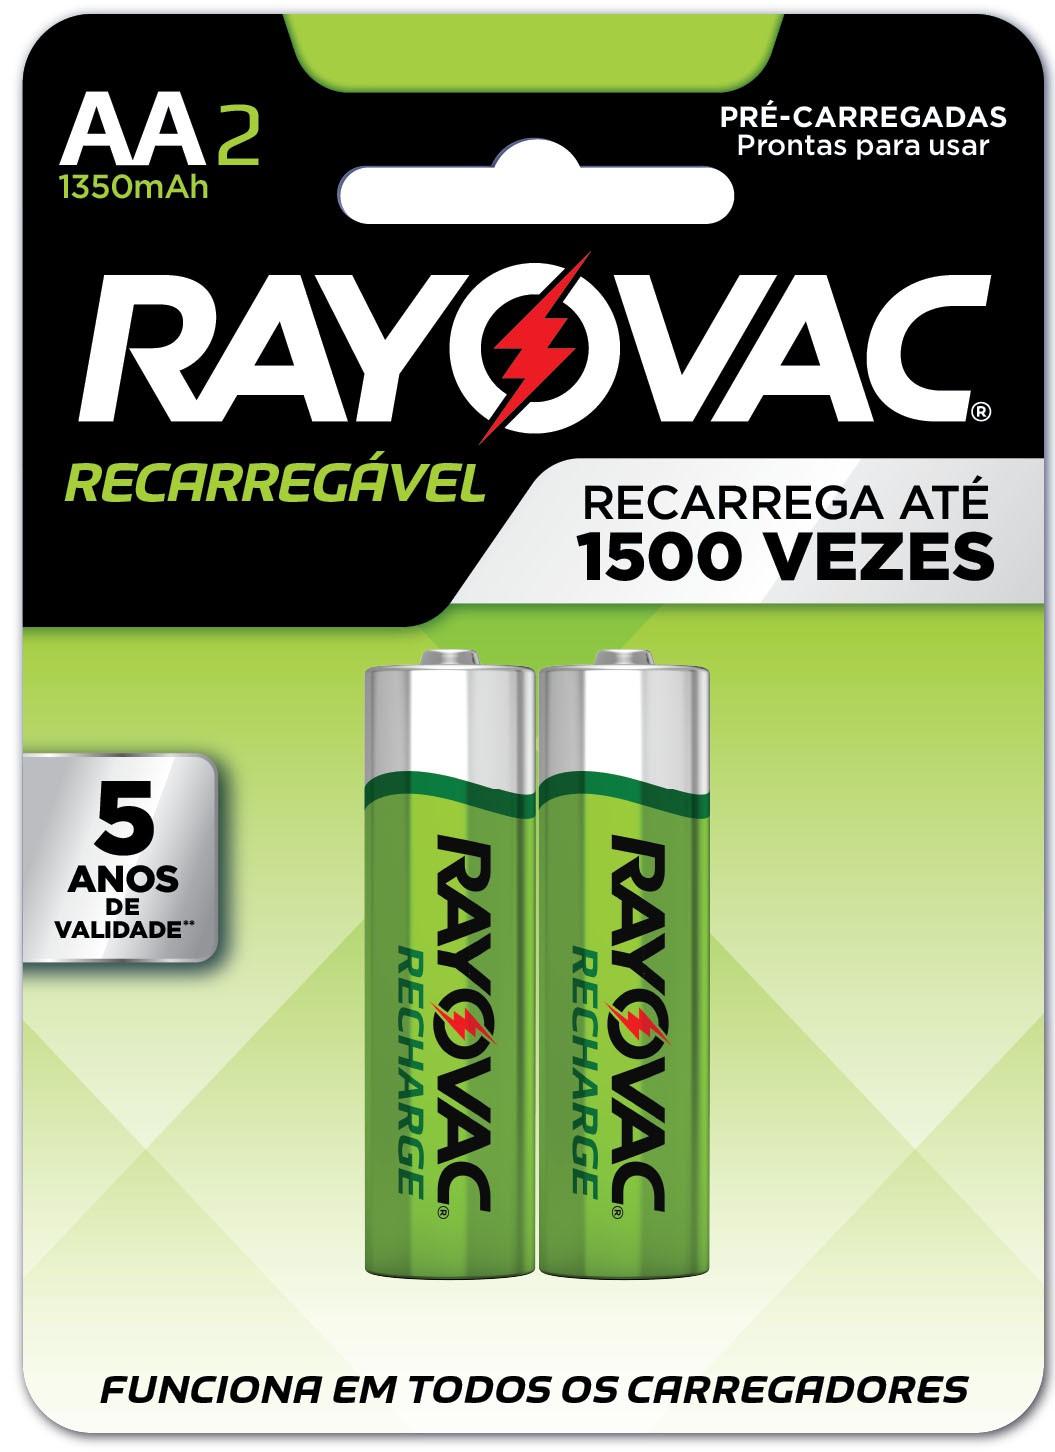 02 Pilhas AA Recarregáveis 1350mAh RAYOVAC 1 cart c/ 2 unid